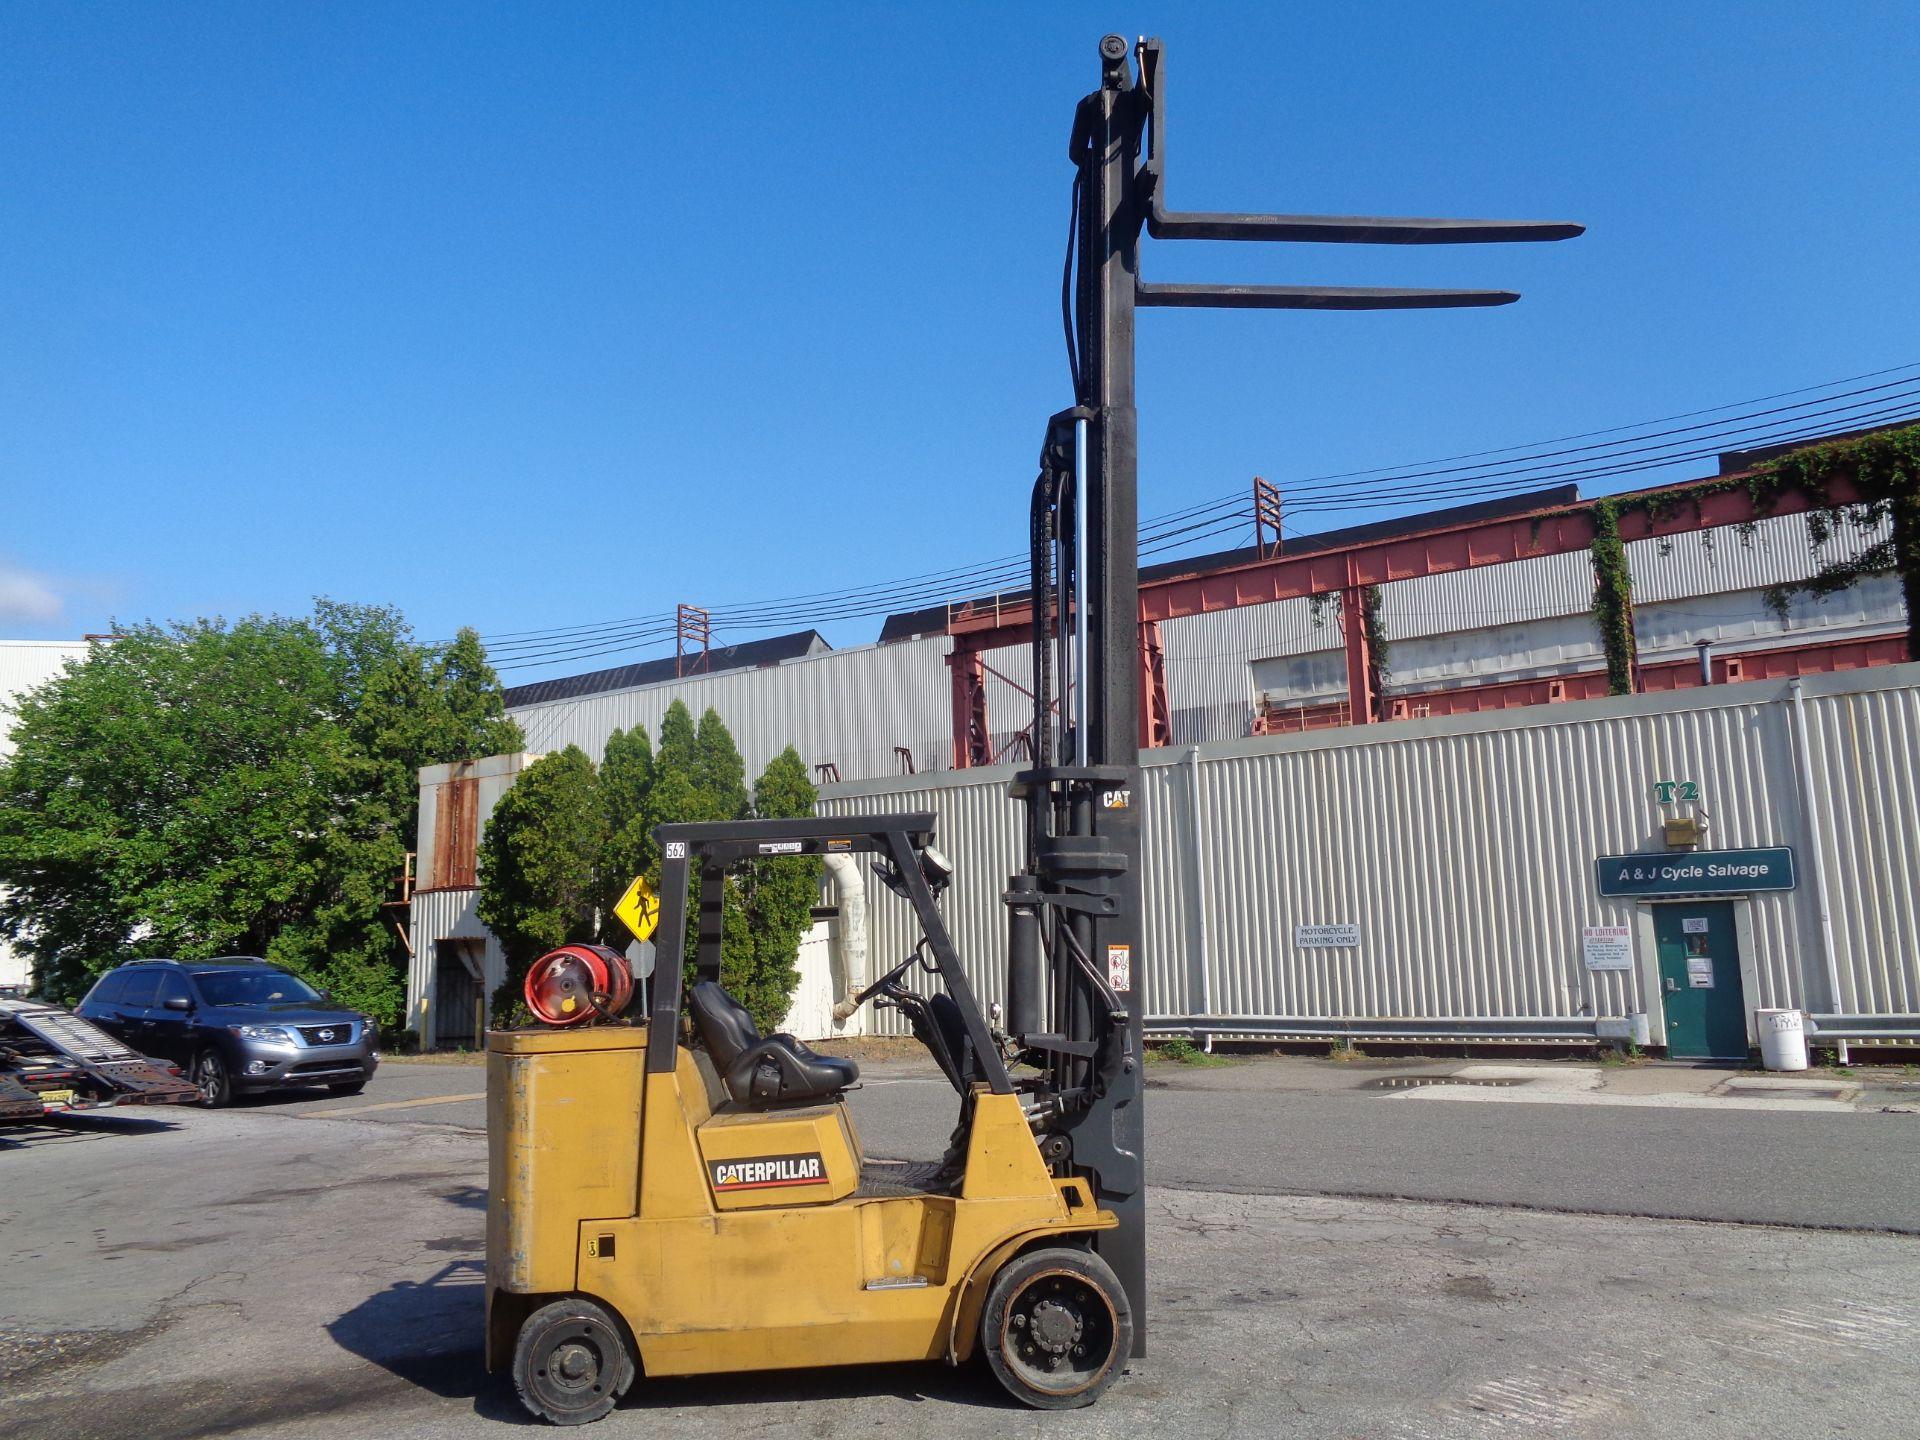 Lot 43 - Caterpillar GC55KSTR 11,000lb Forklift